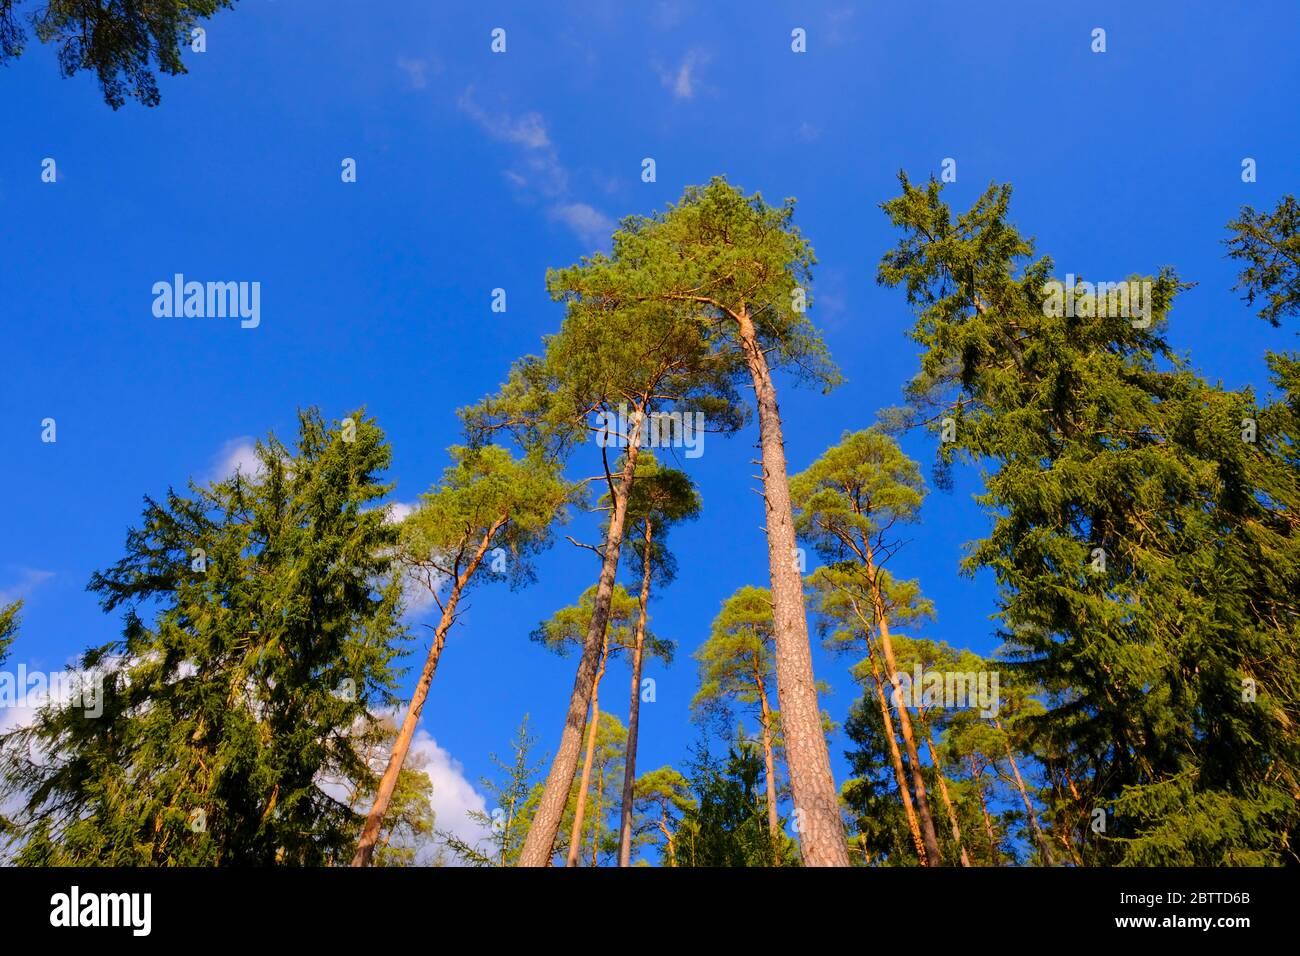 Nadelbaume im Wald, Banque D'Images